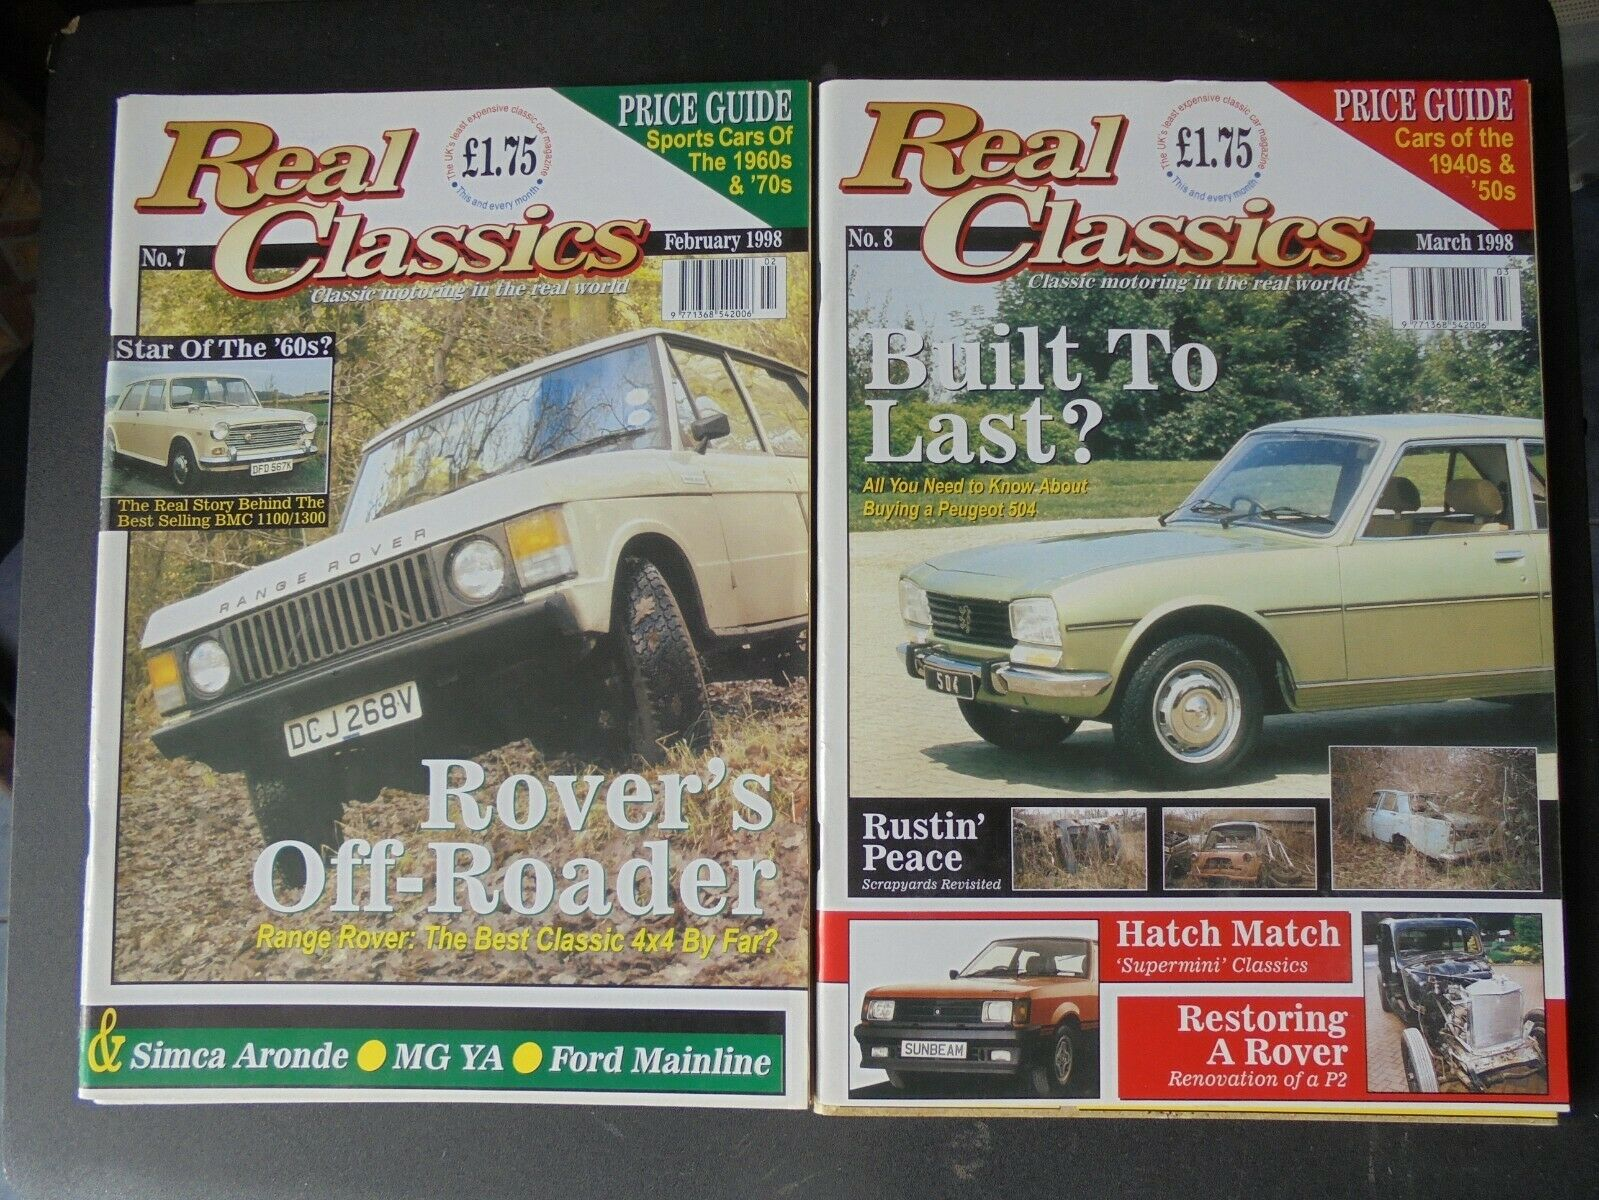 Real Classics 7 & 8.jpg